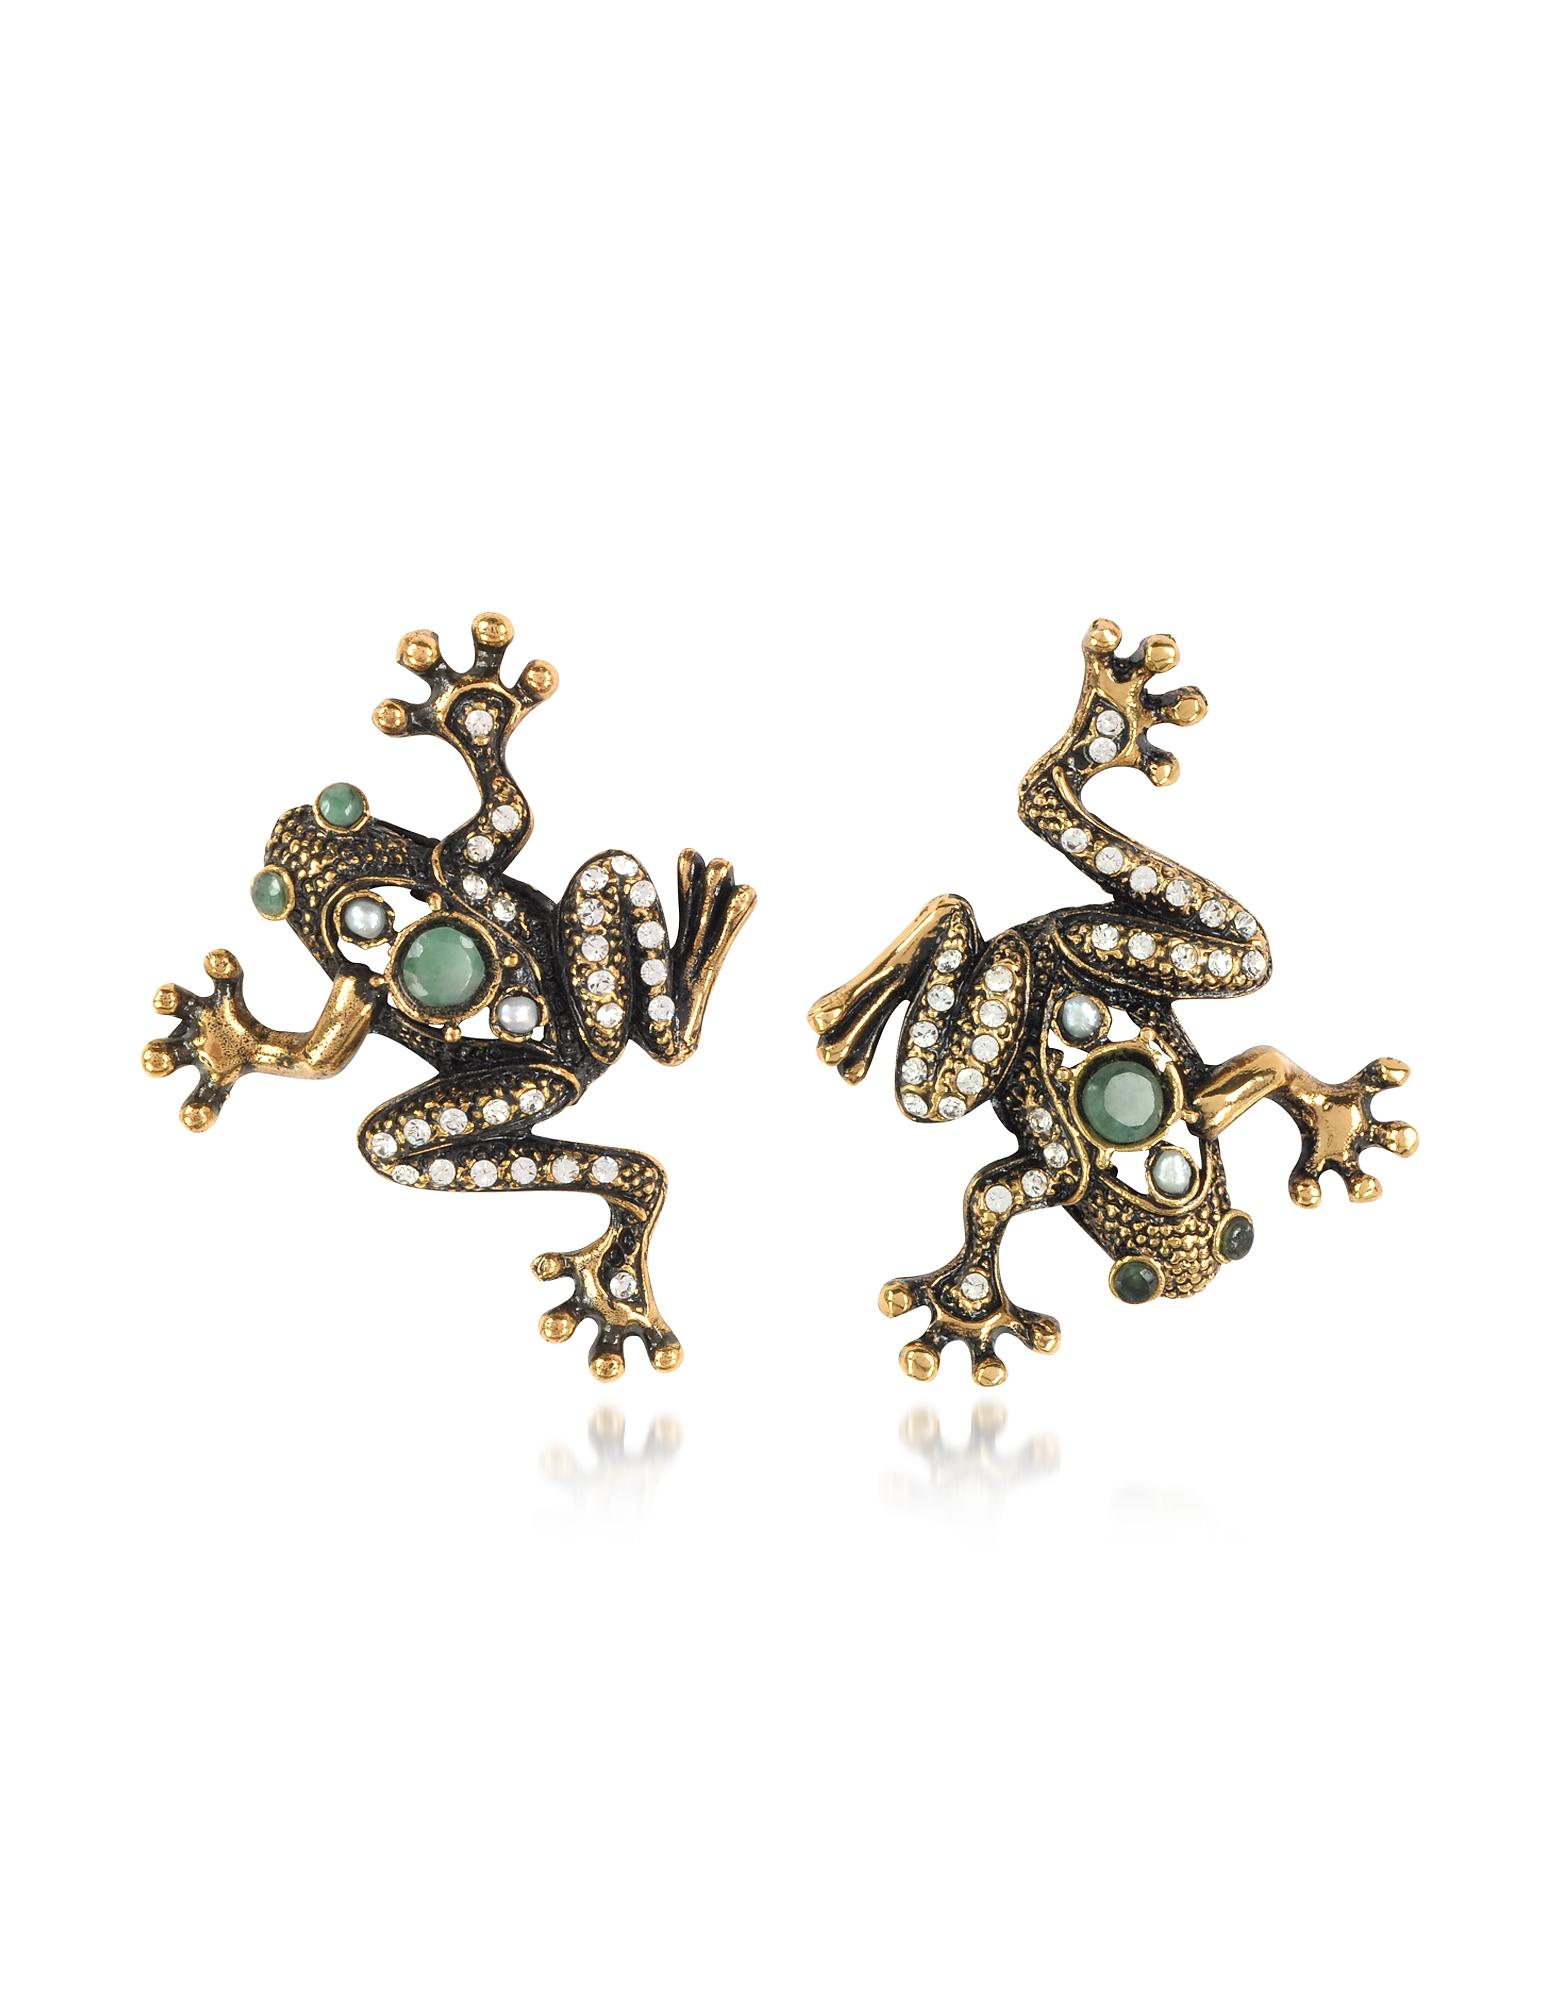 Alcozer & J Designer Earrings, Frog Earrings w/Crystals